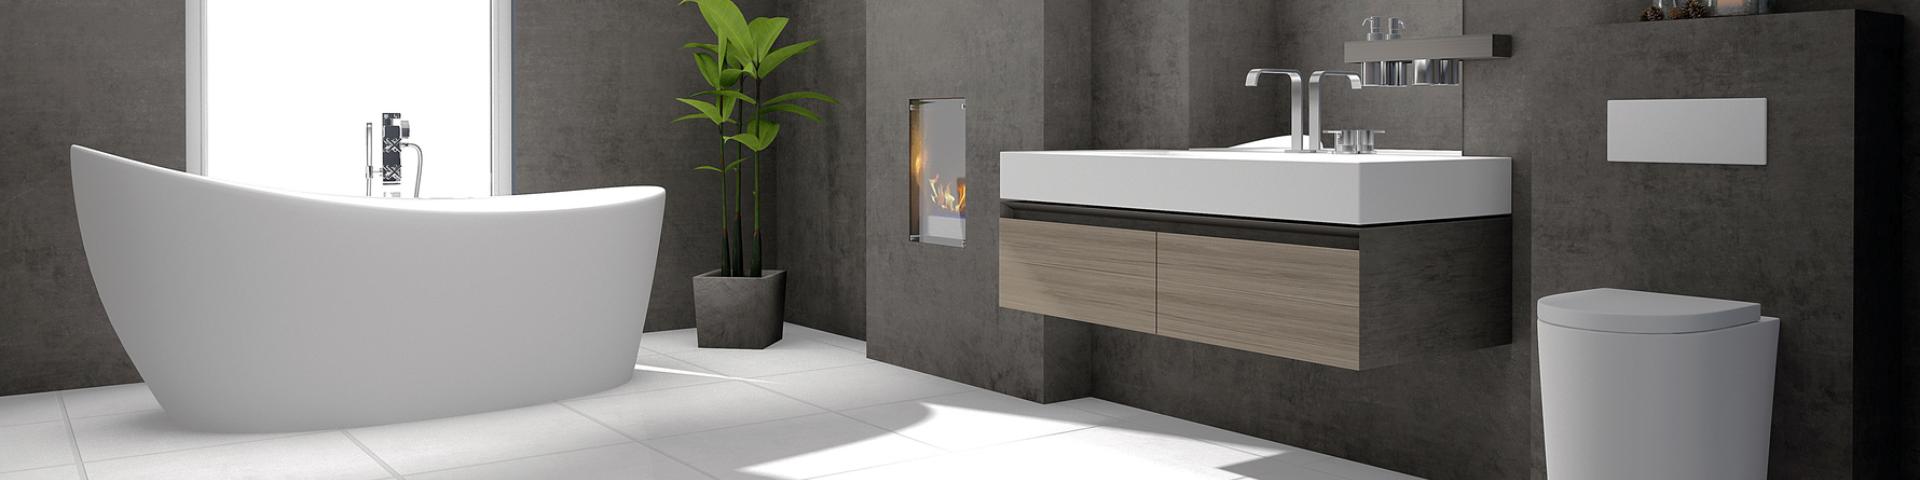 haustechnik greifswald. Black Bedroom Furniture Sets. Home Design Ideas